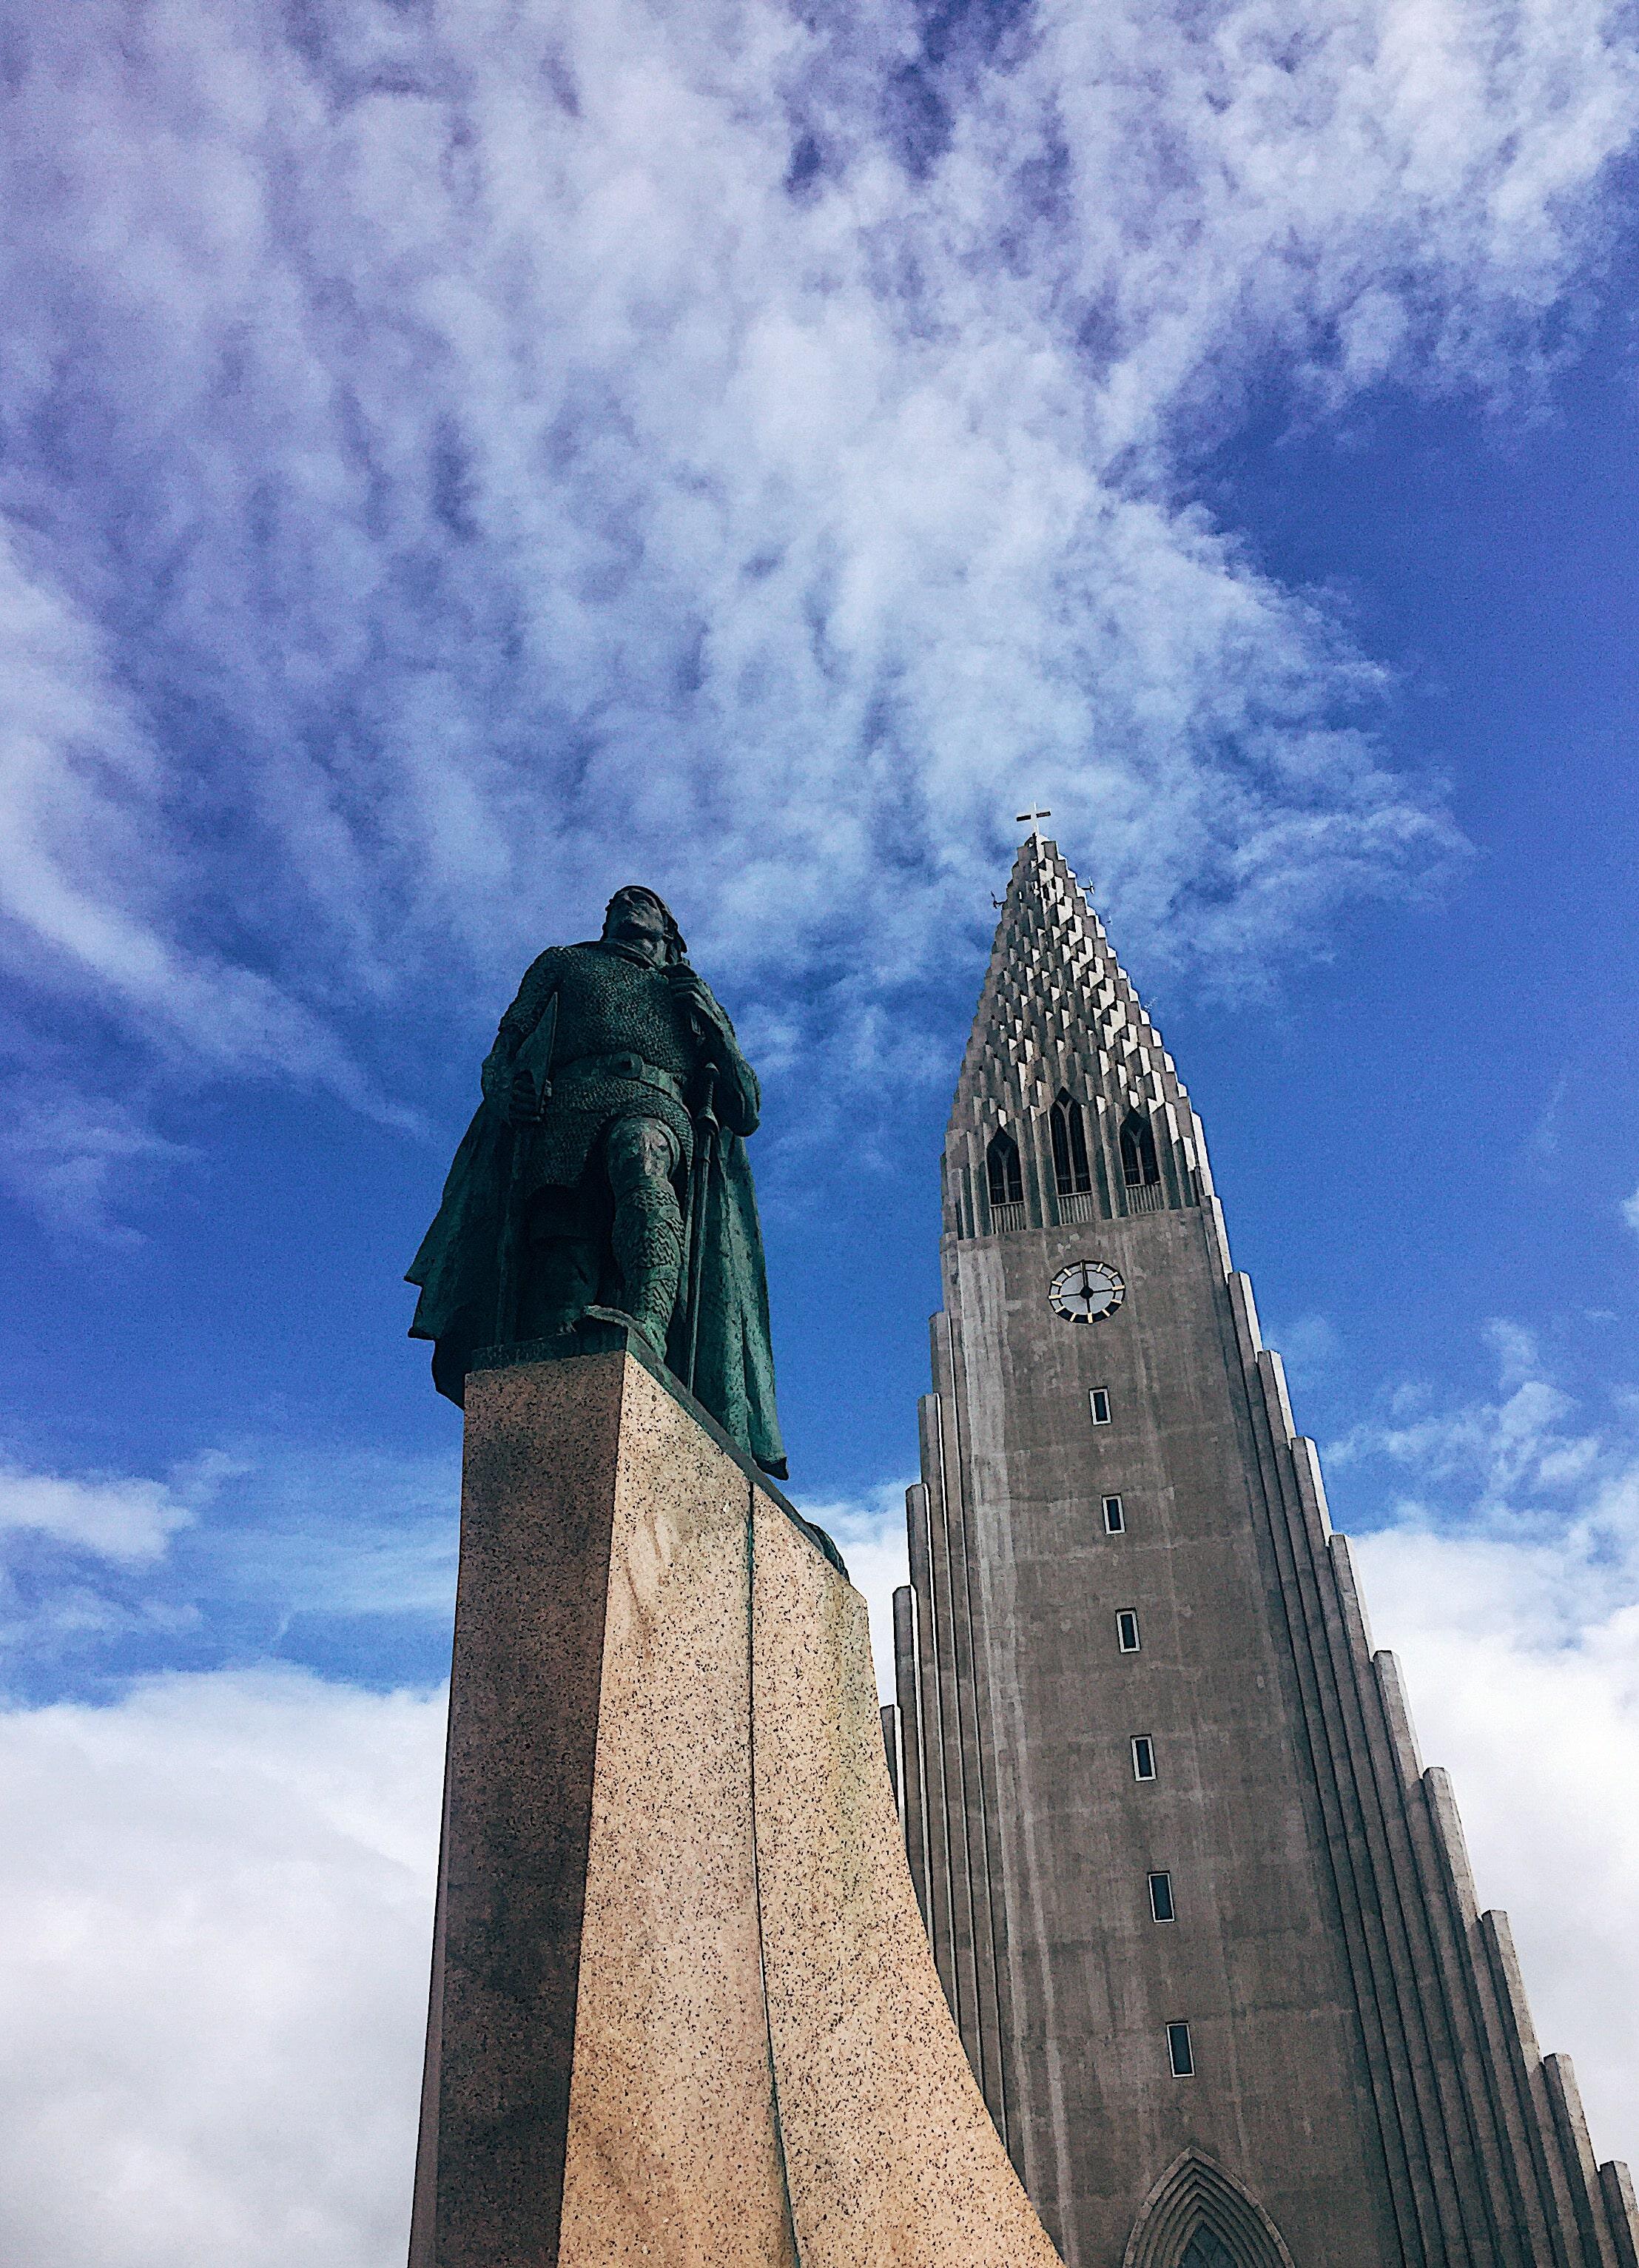 Viking and Christian contrast. Hallgrímskirkja, the tallest church in Iceland with Leif Eriksson, explorer.